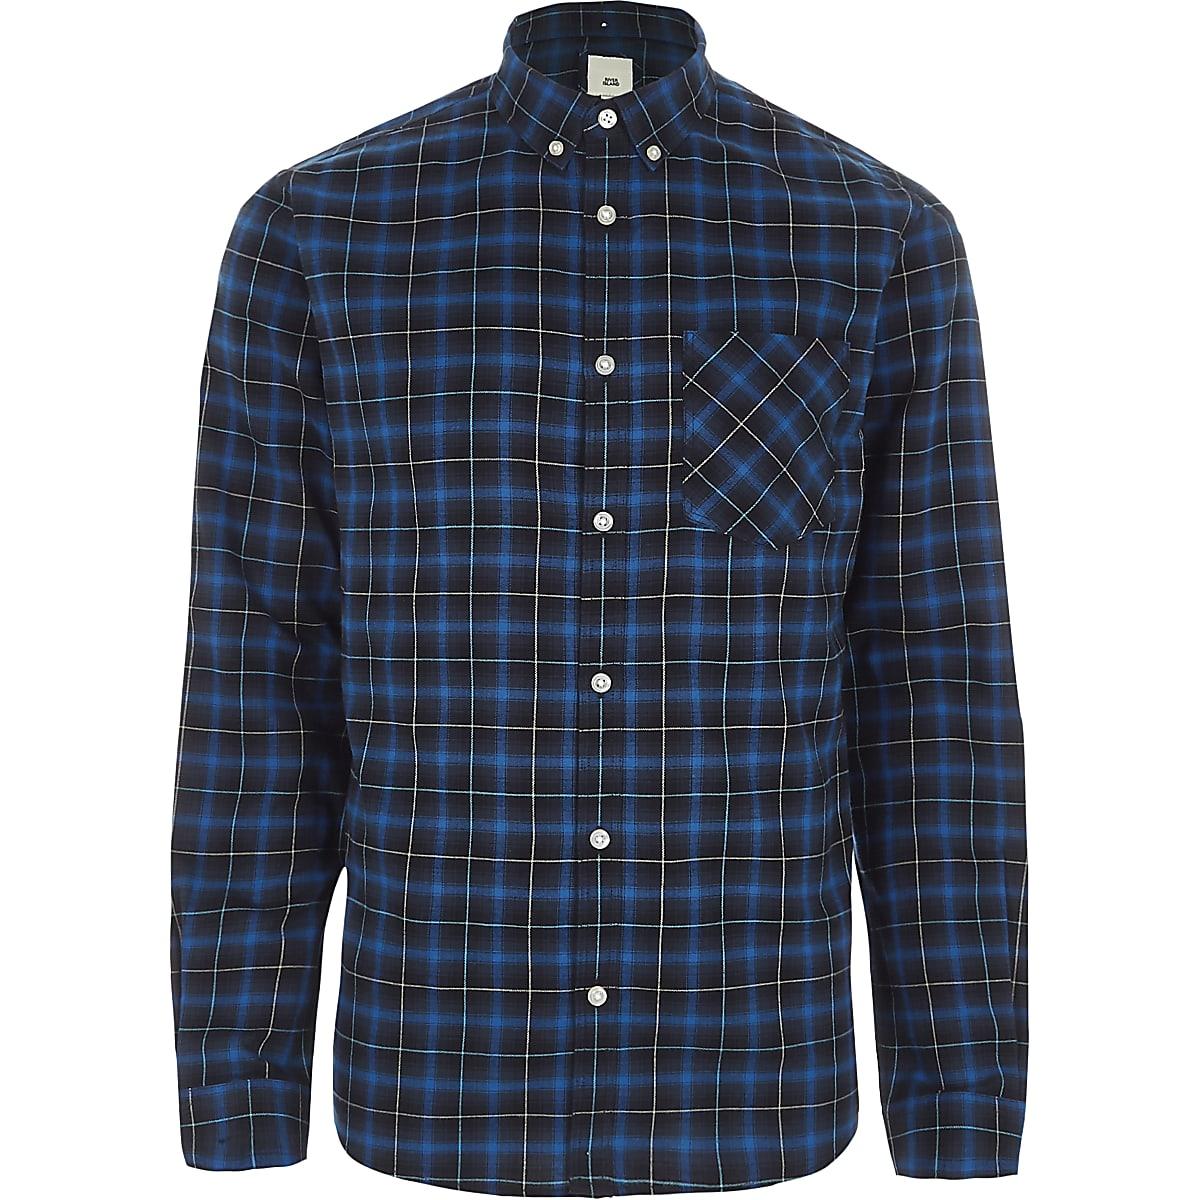 Blue check button-down collar shirt